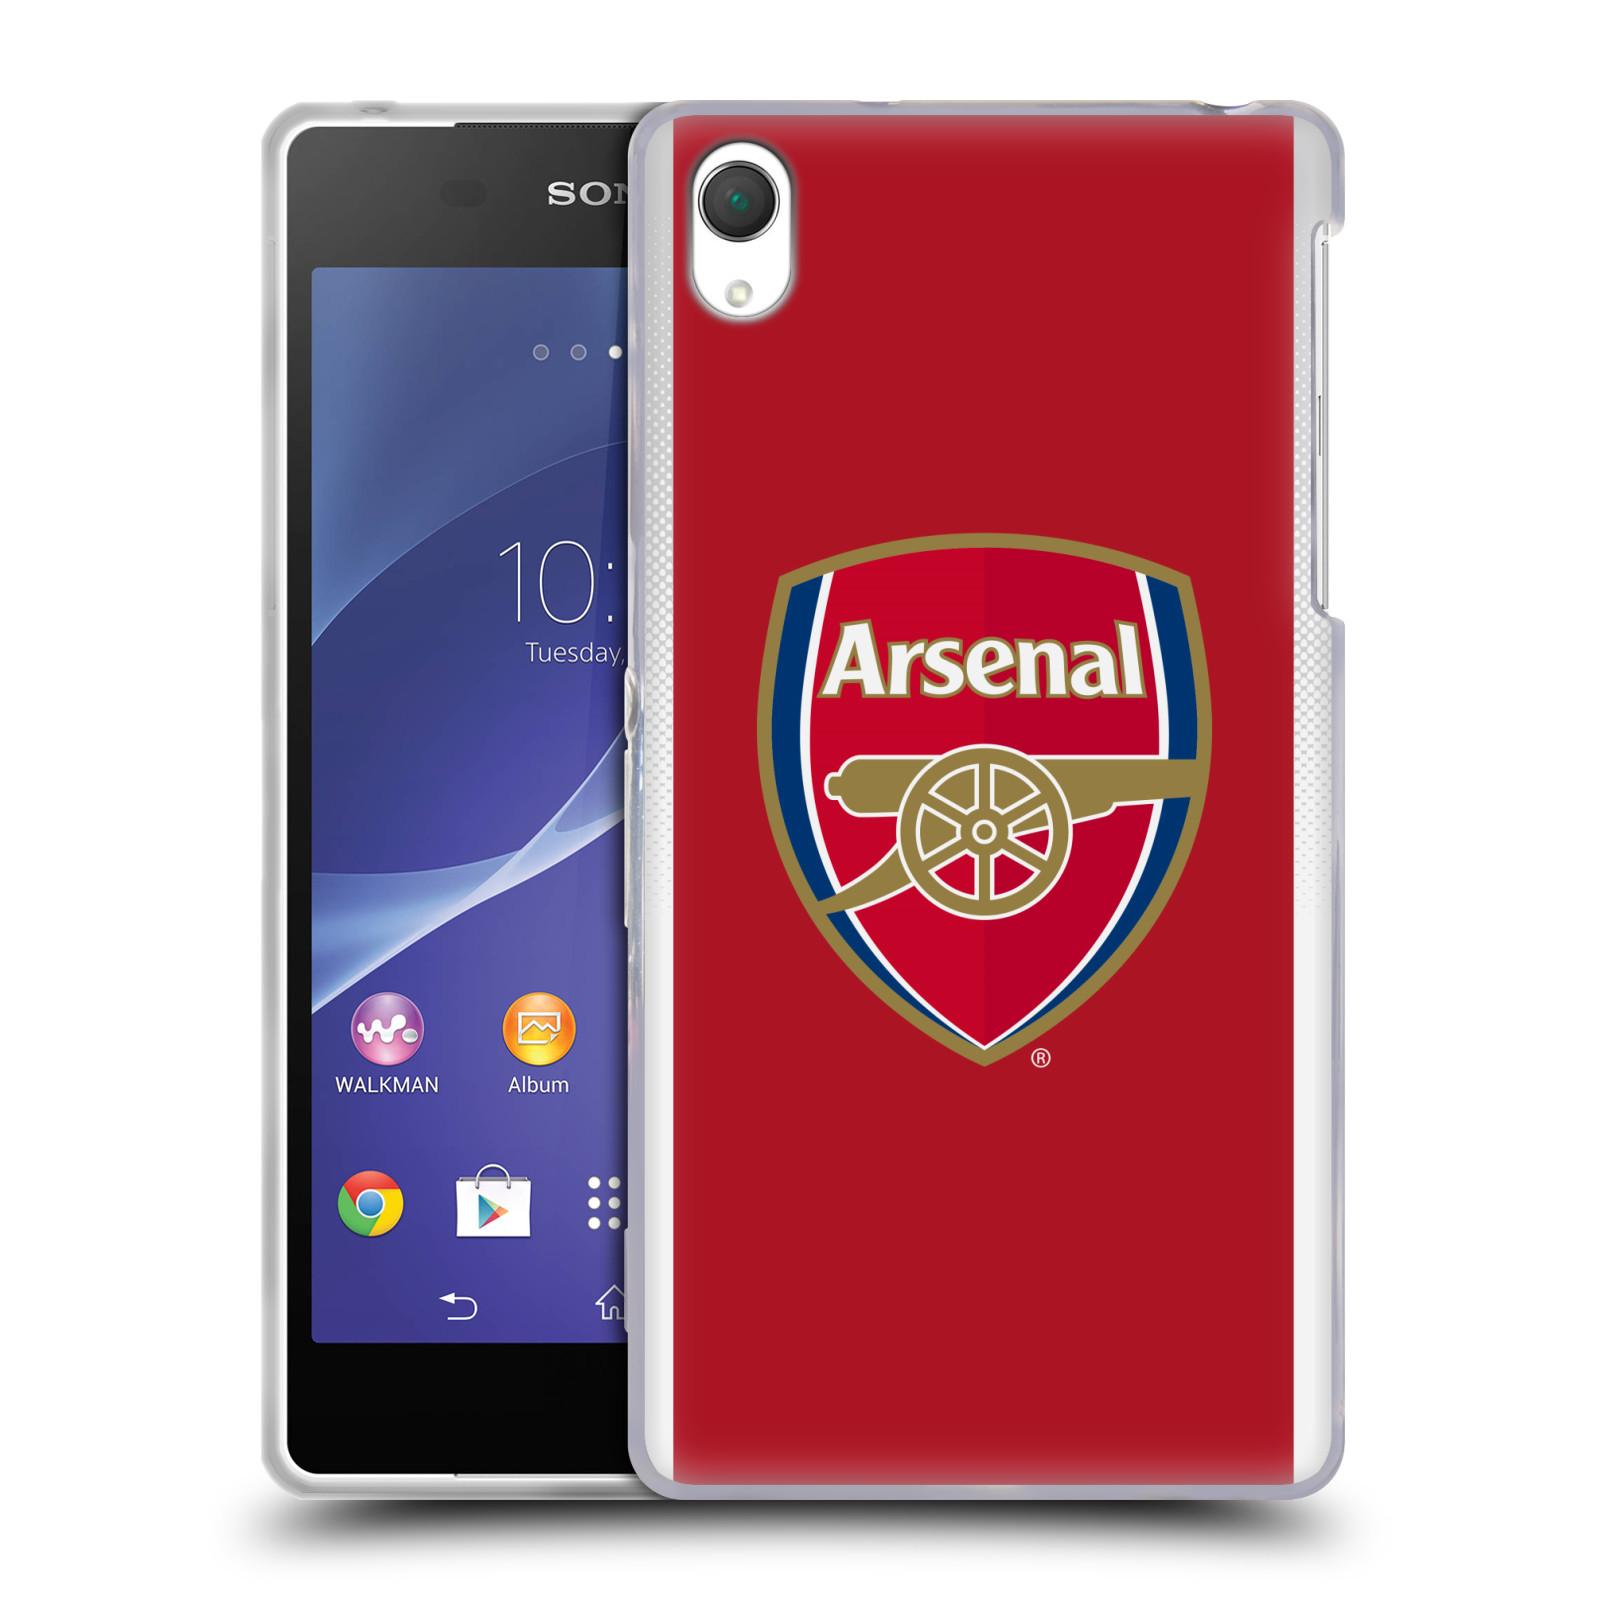 Silikonové pouzdro na mobil Sony Xperia Z2 D6503 - Head Case - Arsenal FC - Logo klubu